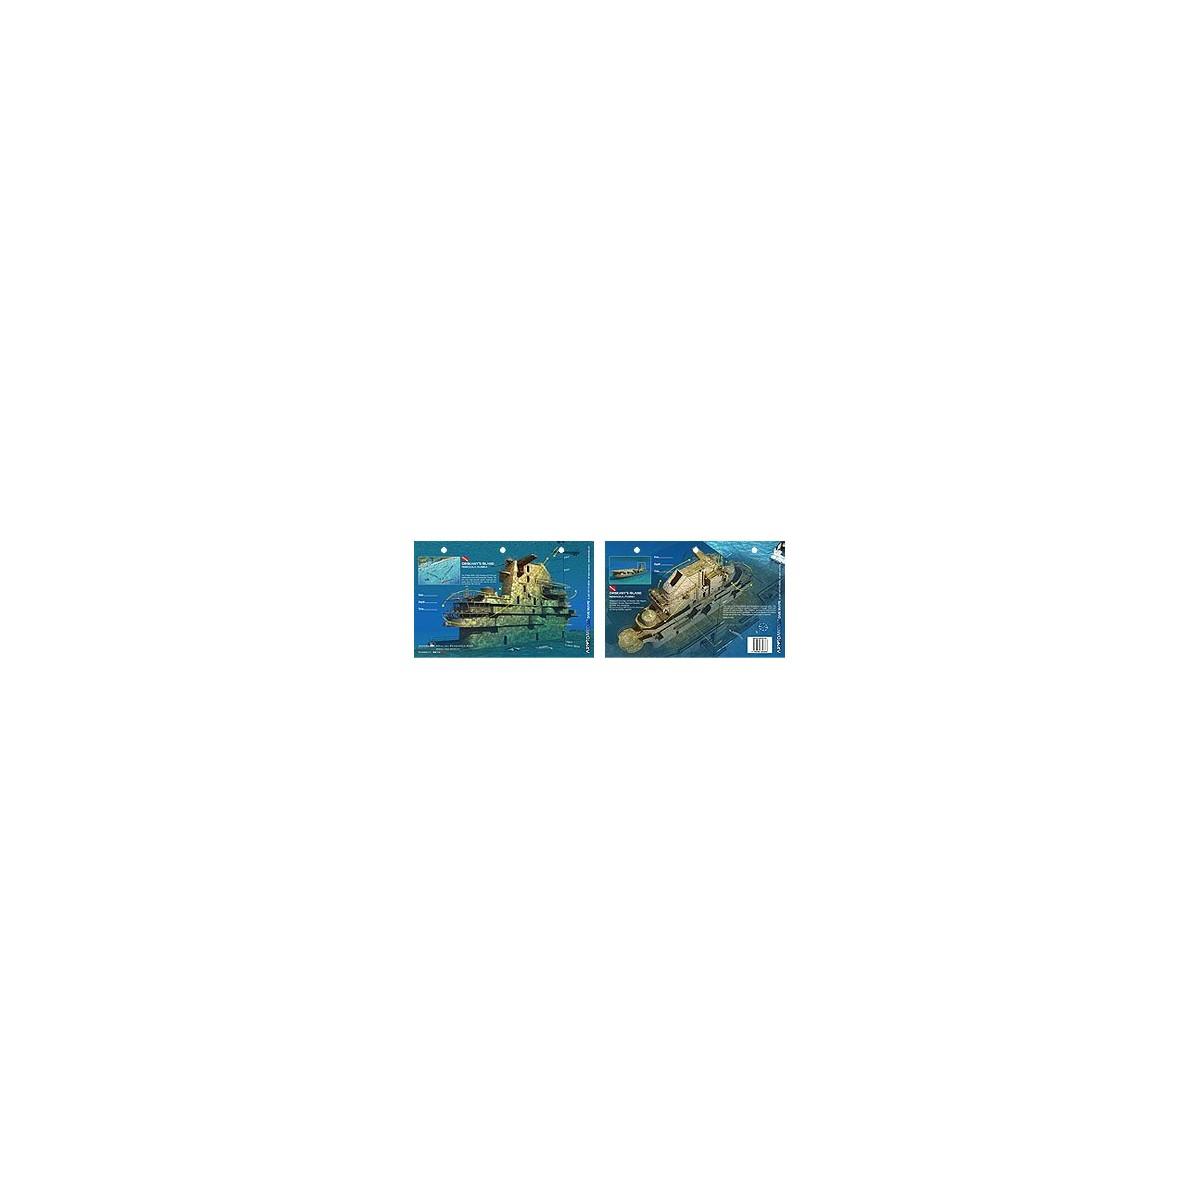 Oriskany`s Island in Pensacola, Florida (8.5 x 5.5 Inches) (21.6 x 15cm) - New Art to Media Underwater Waterproof 3D Dive Site M